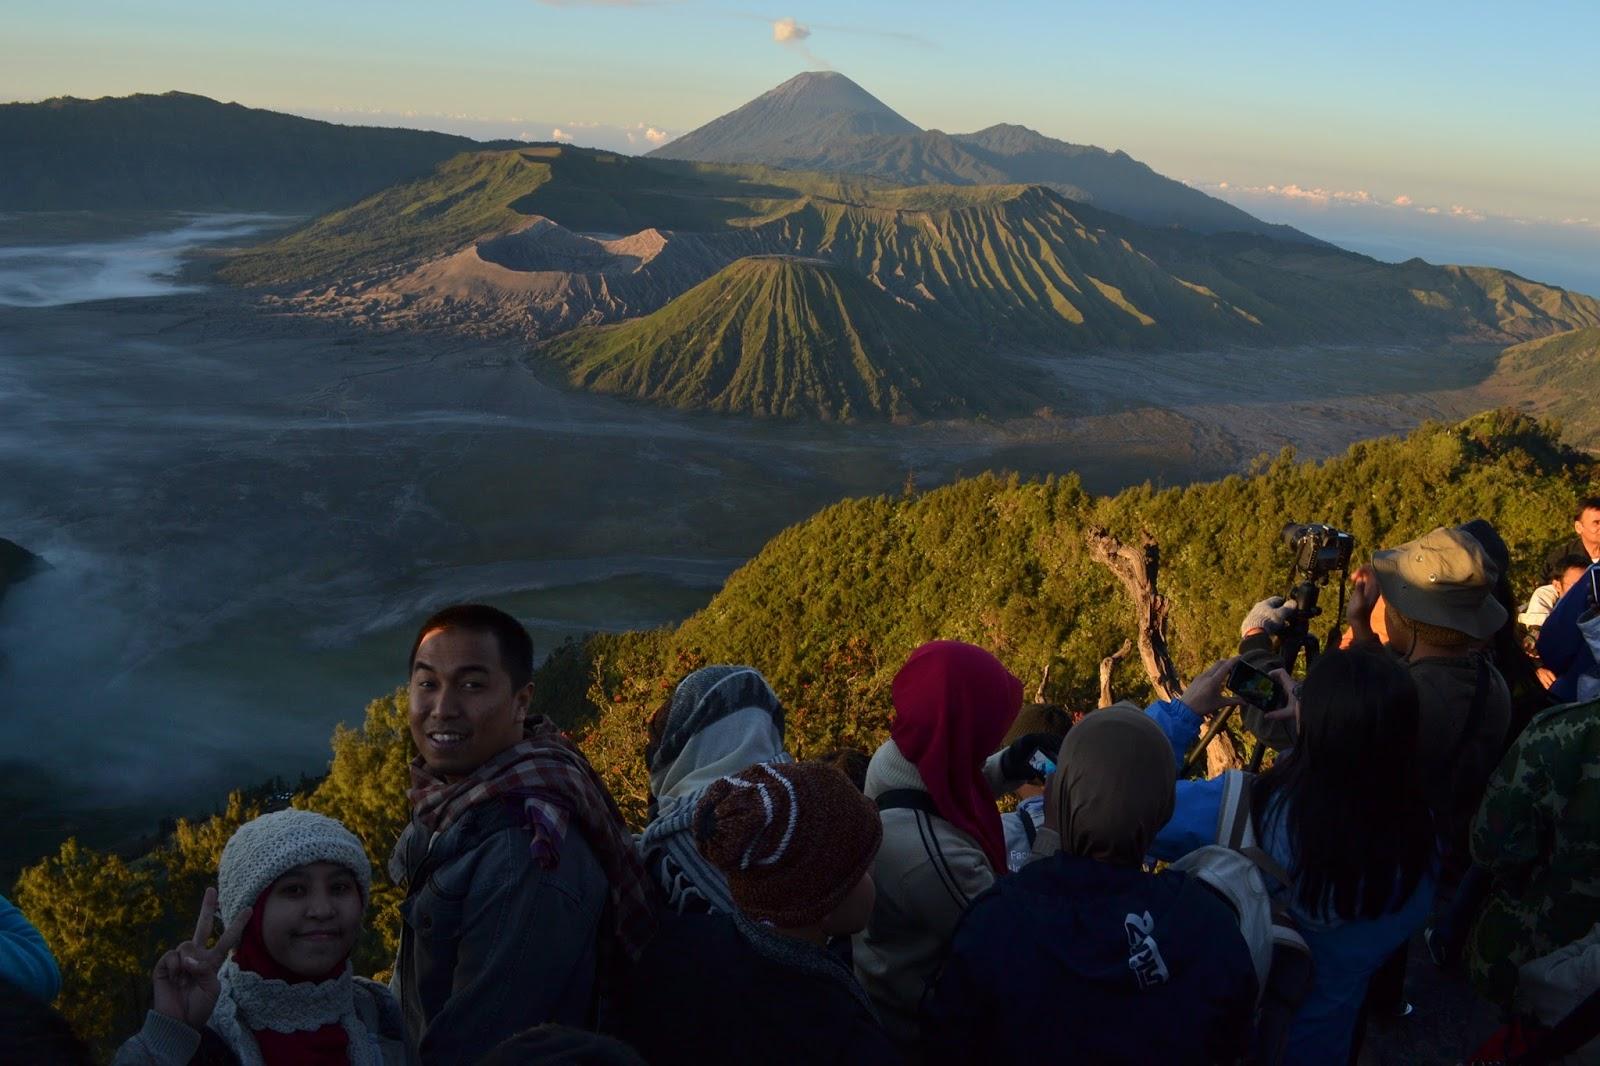 Sunrise Bukit Penanjakan Voluntourism Bromo Book for Mountain